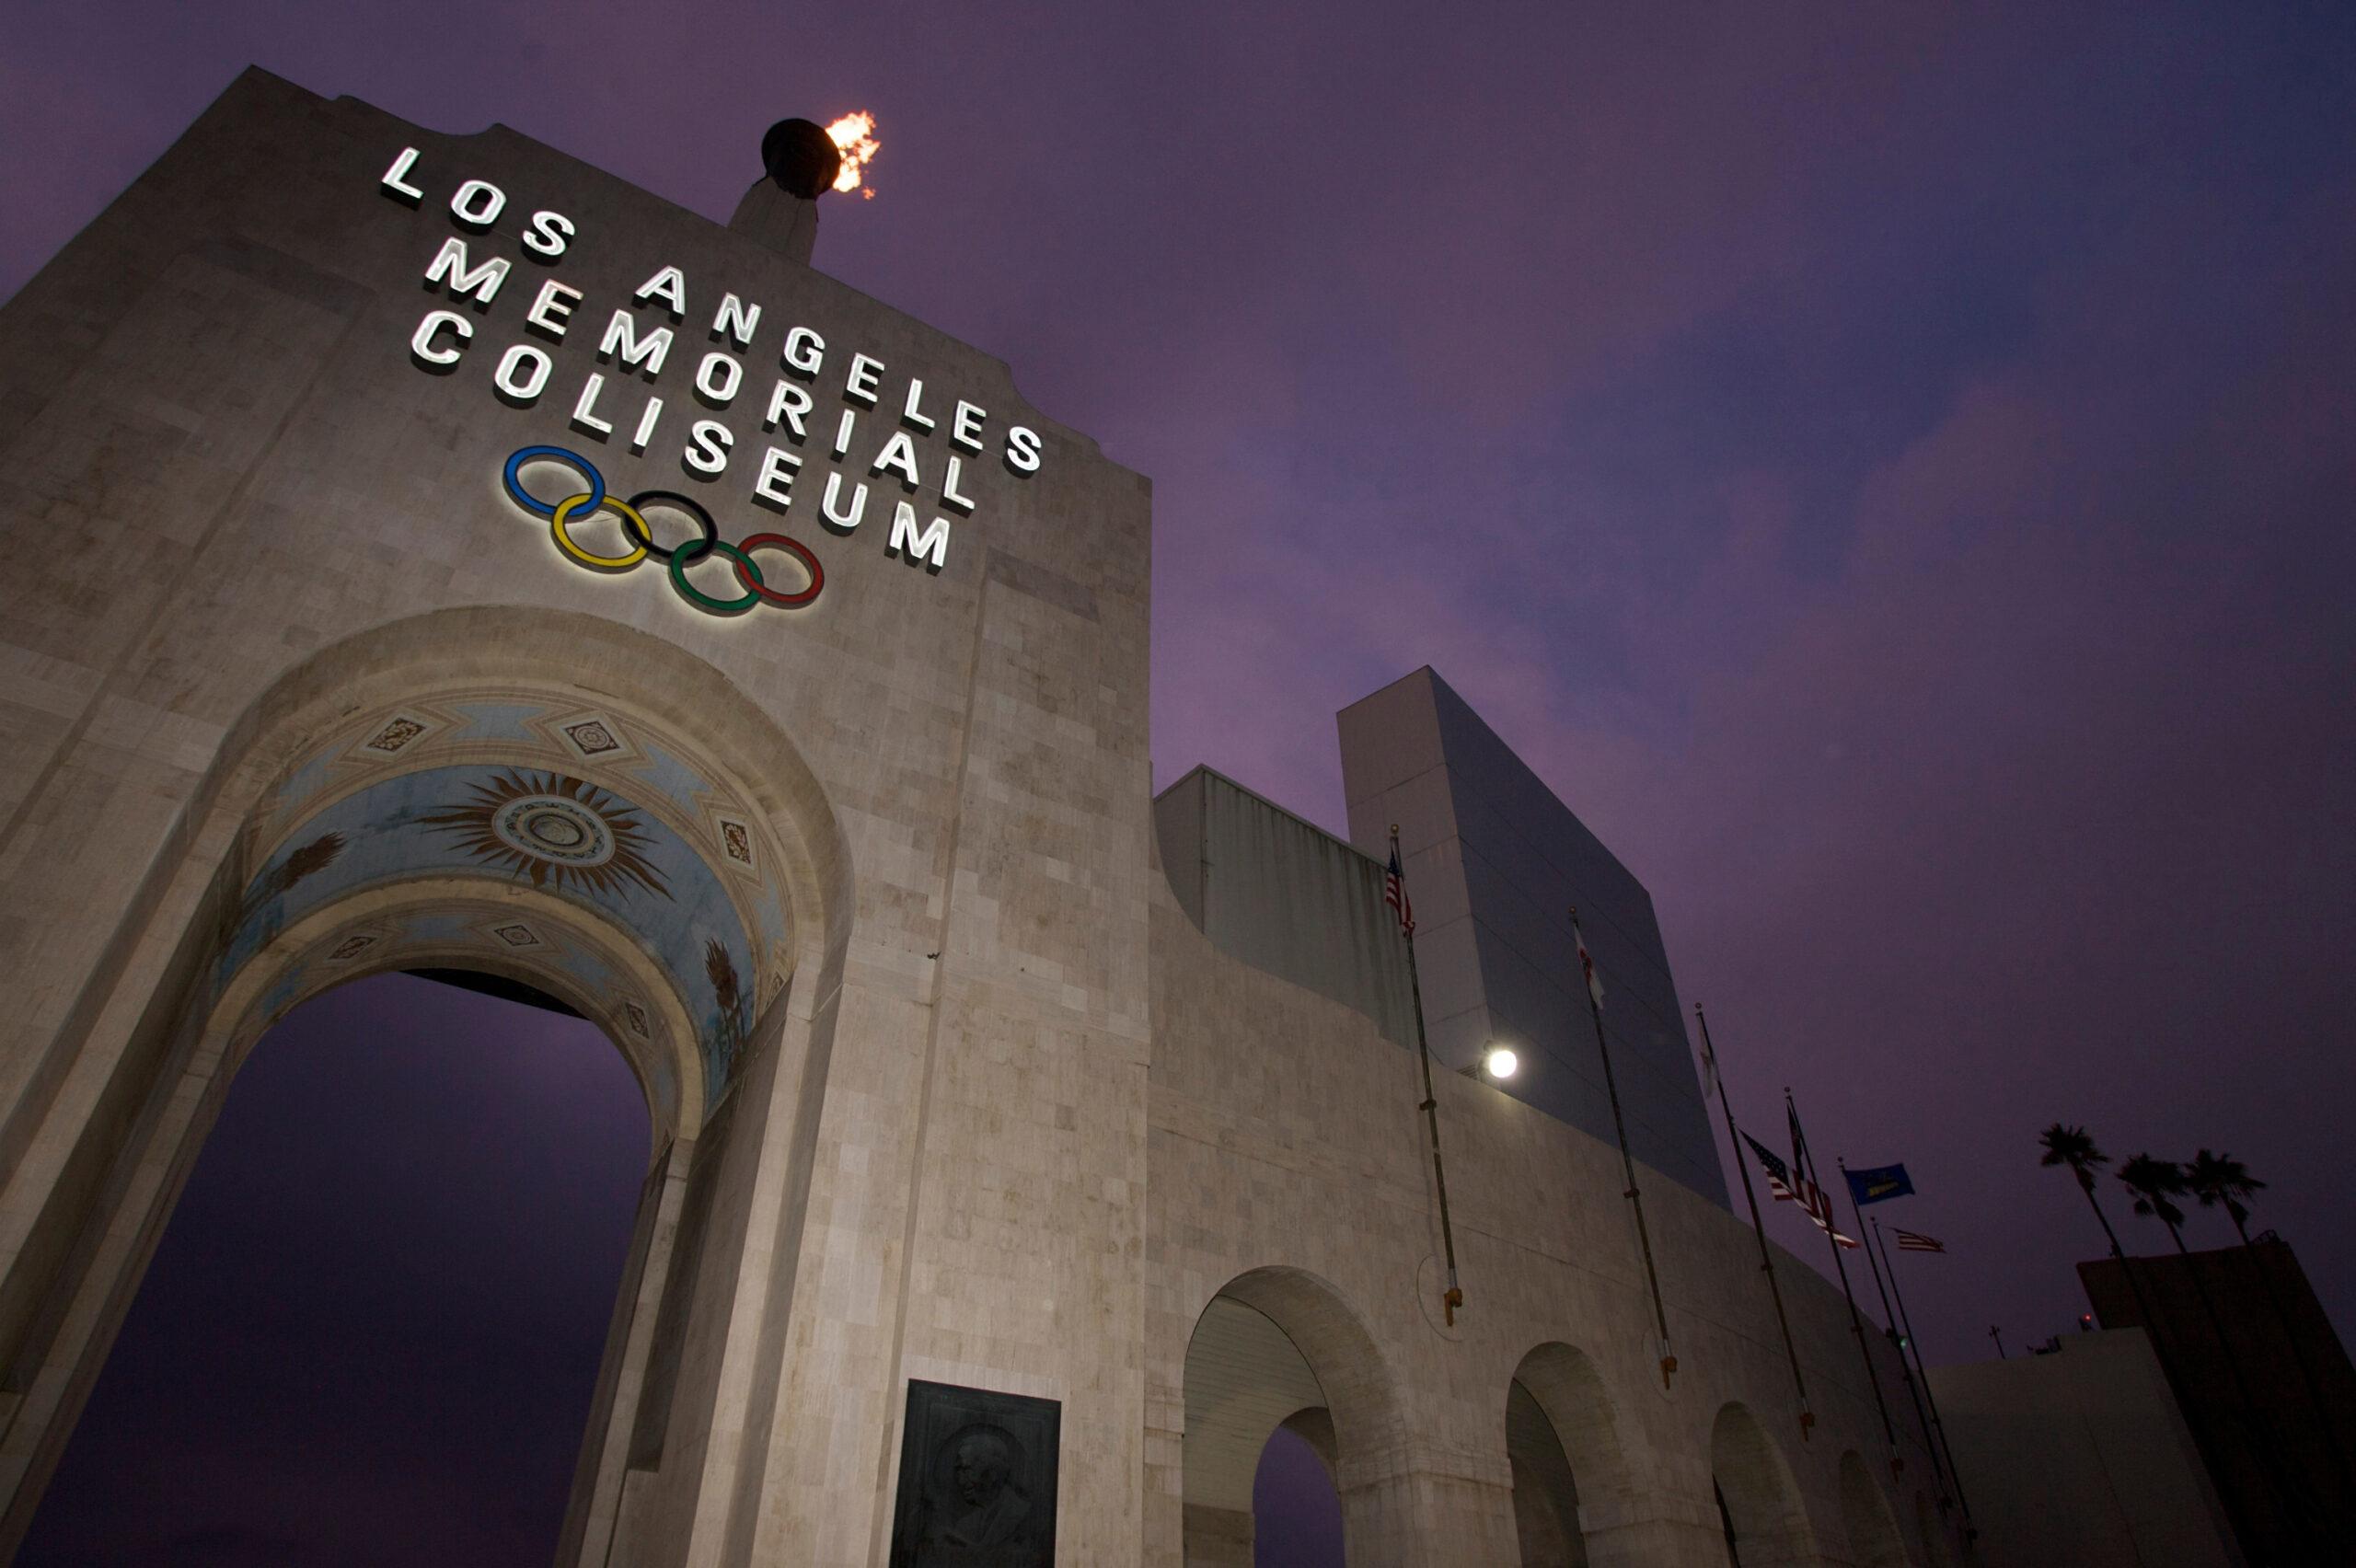 Coliseum Renovation